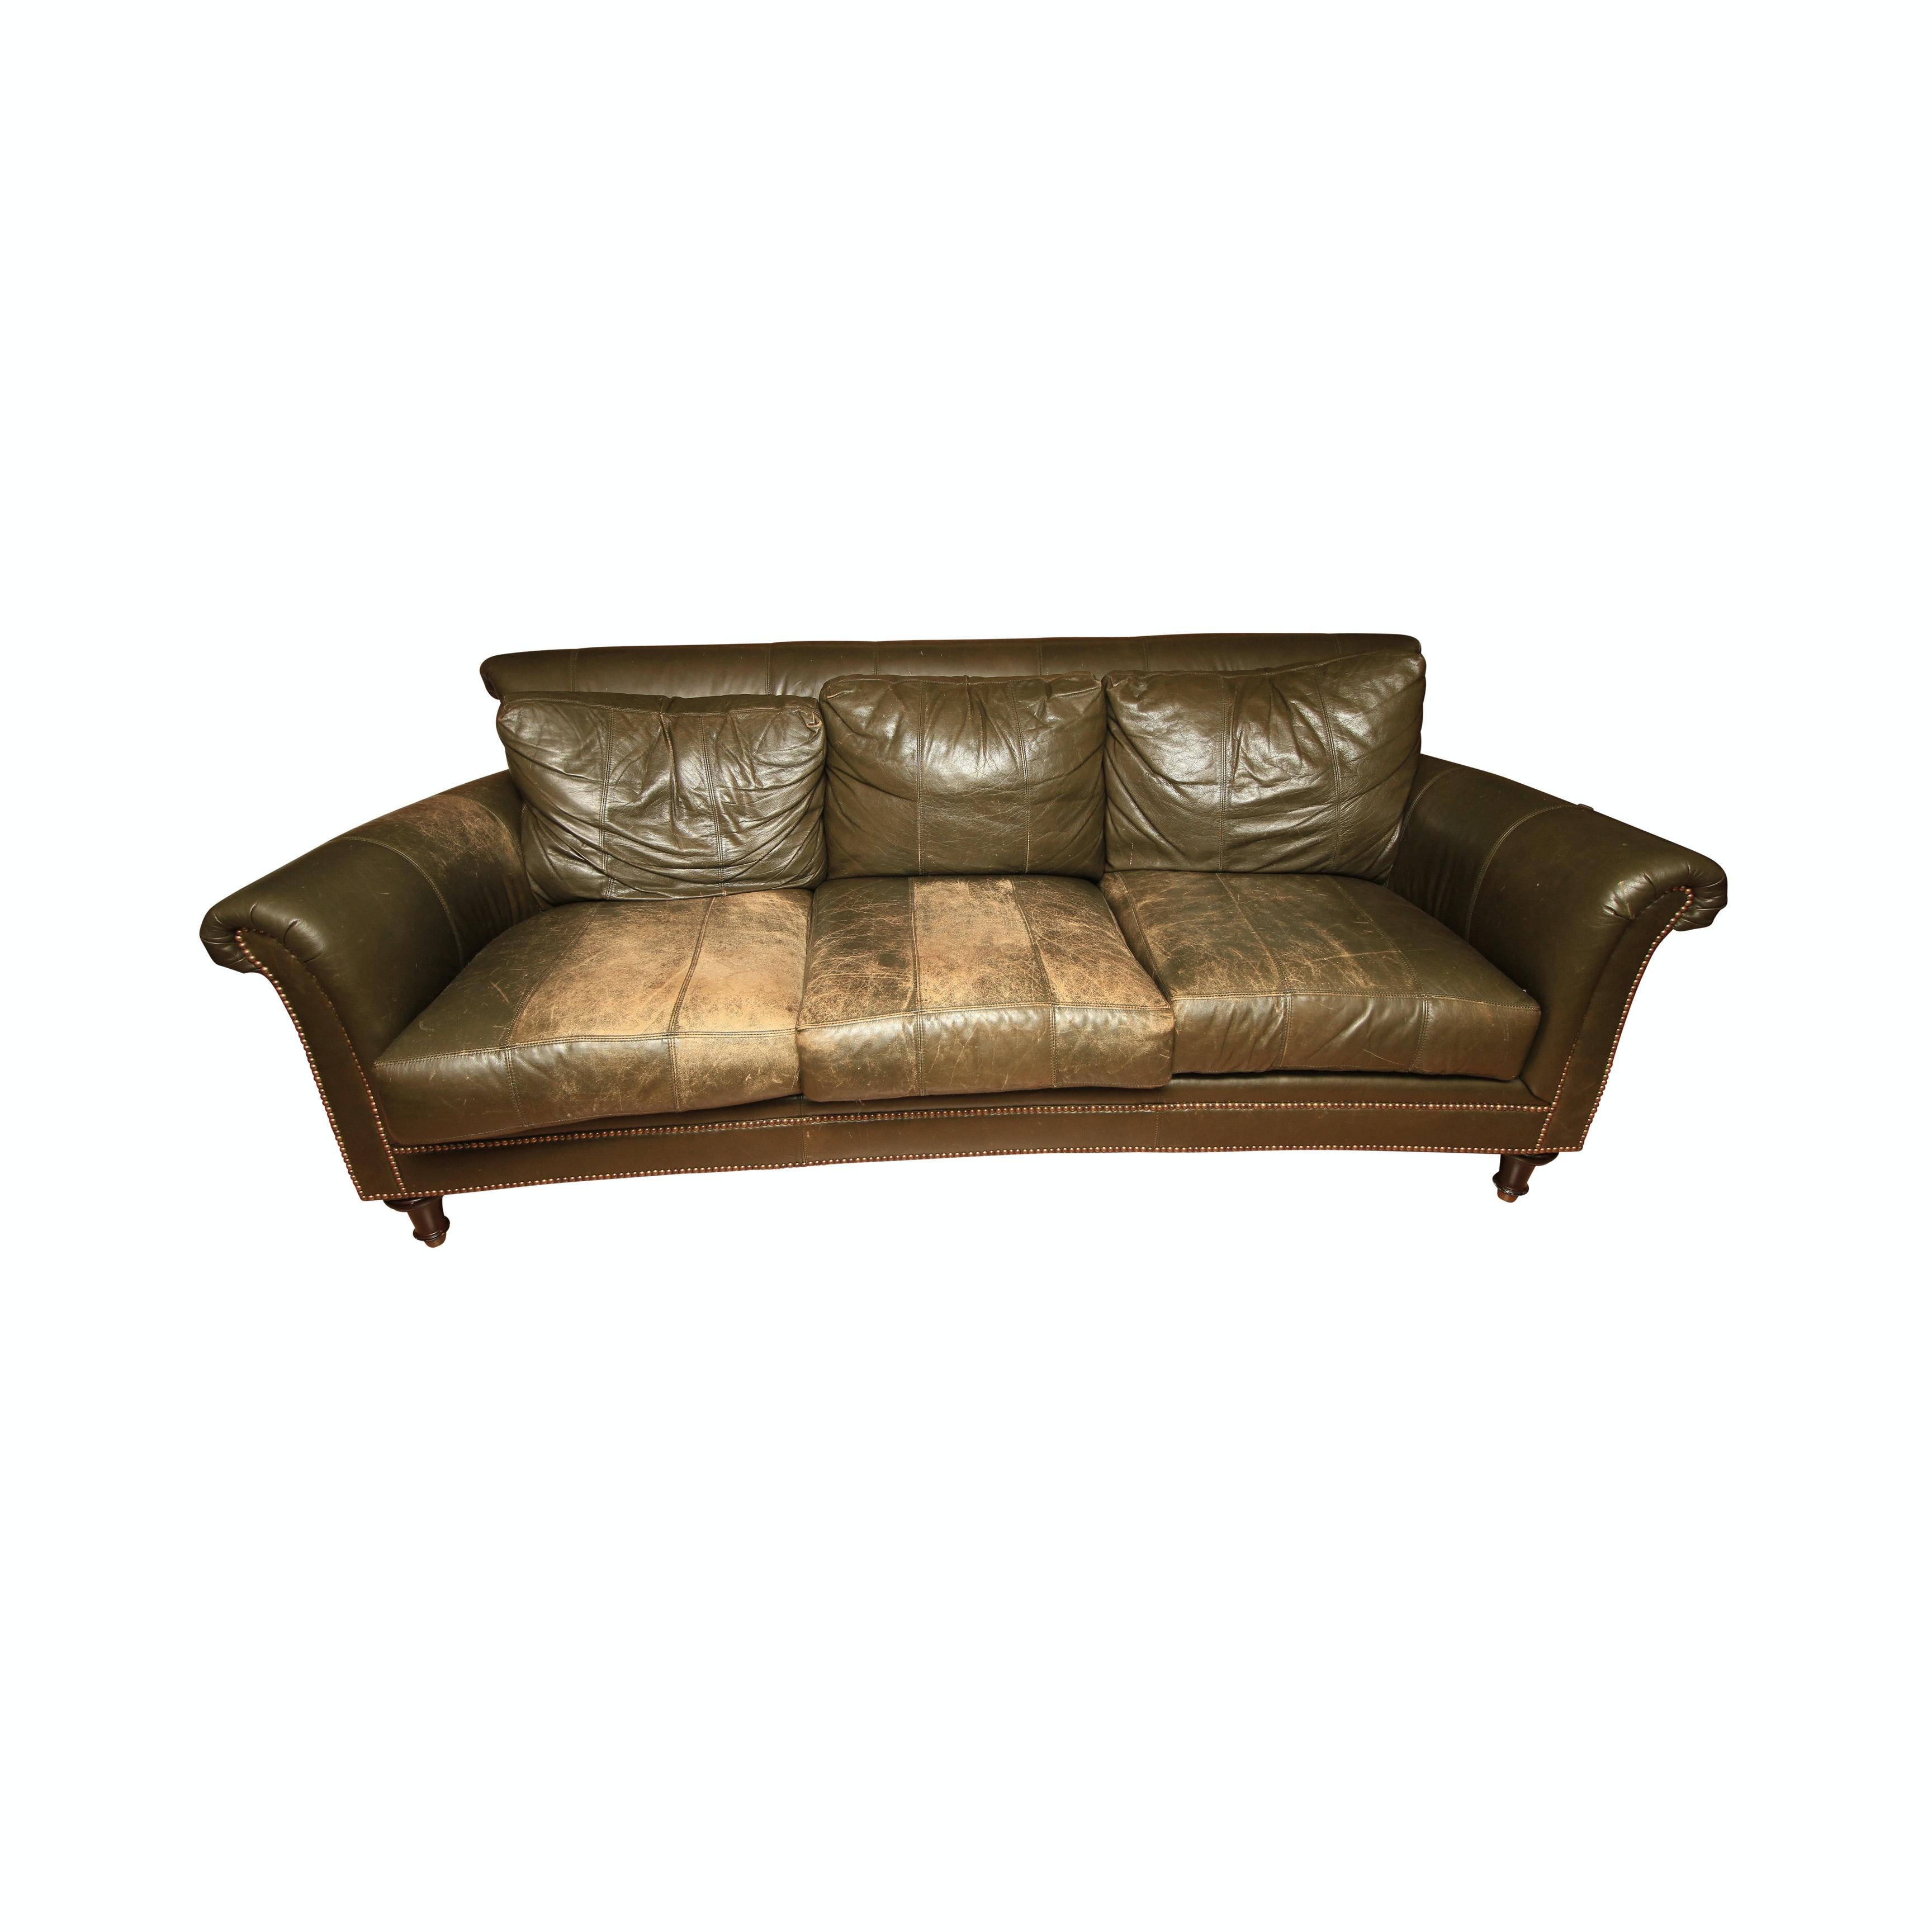 Vintage Leather Sofa by Ferguson Copeland Ltd.